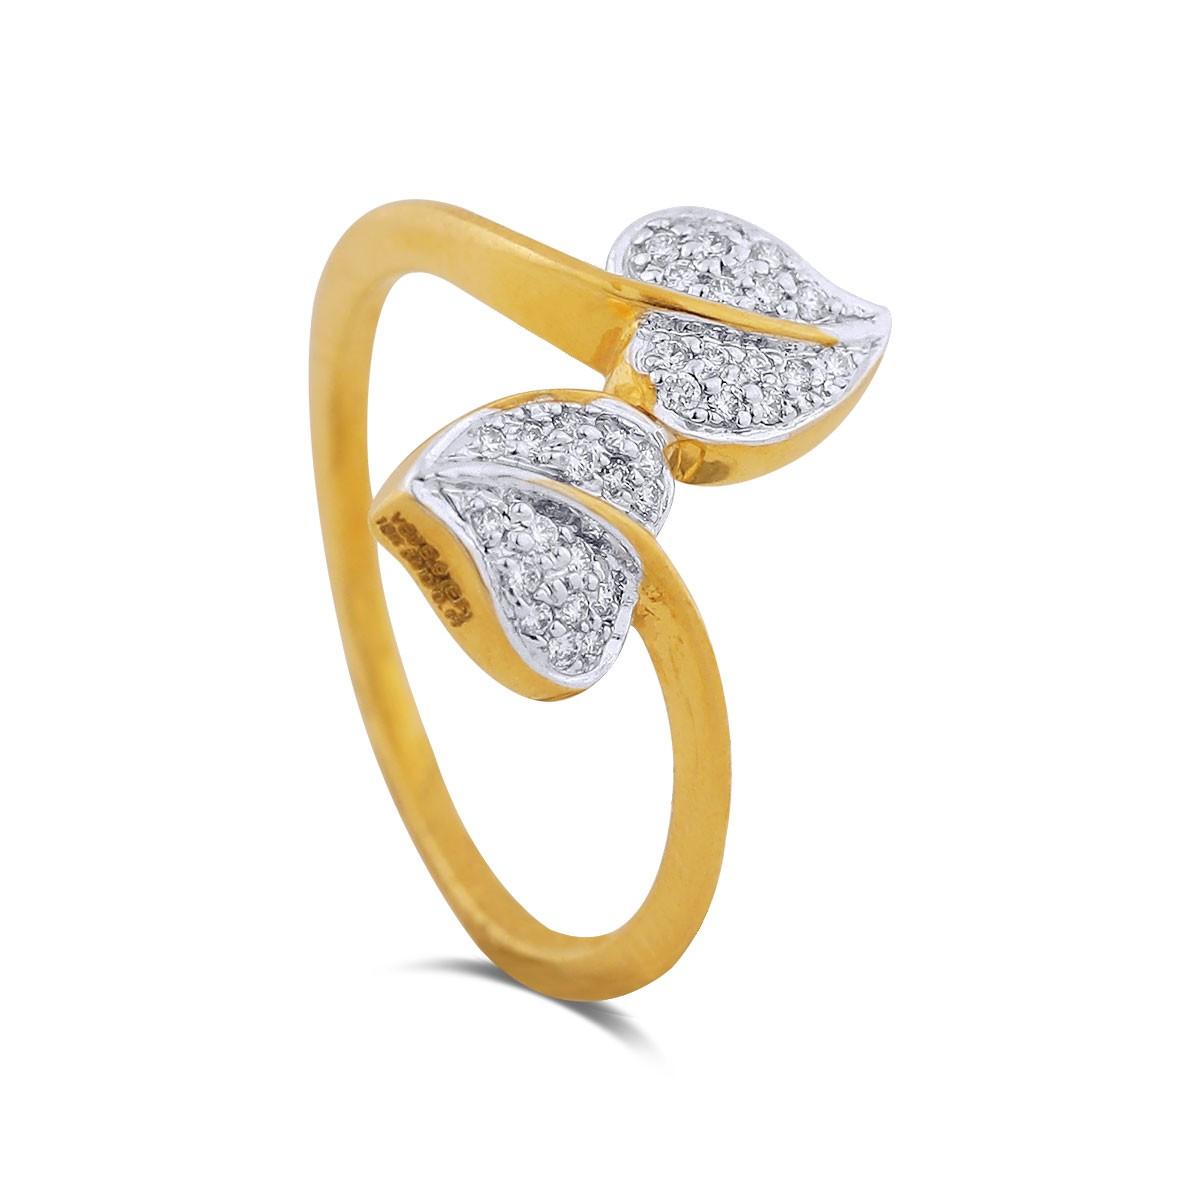 Josie Yellow Gold Diamond Ring